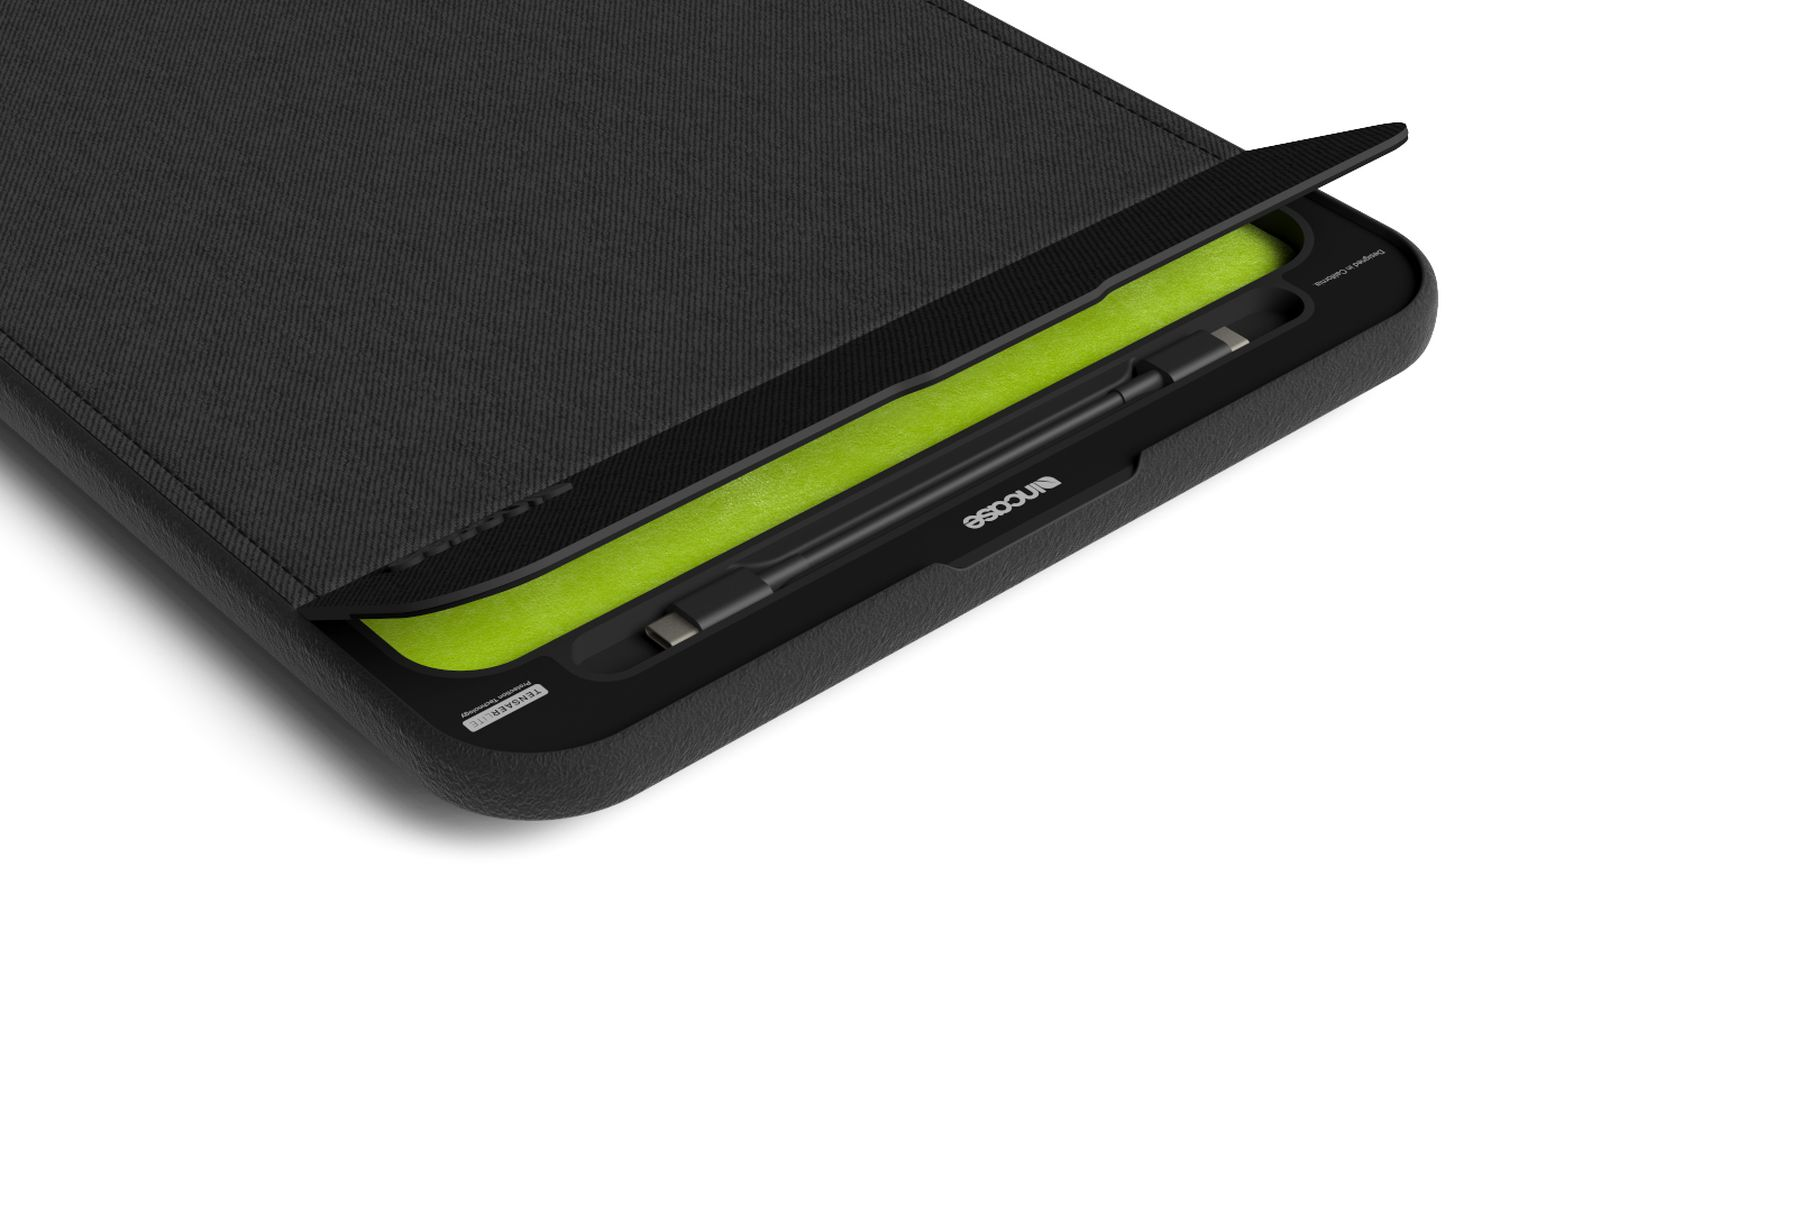 pretty nice 9ad20 8ccb5 Incase announces 14,000 mAh battery case for MacBook Pro